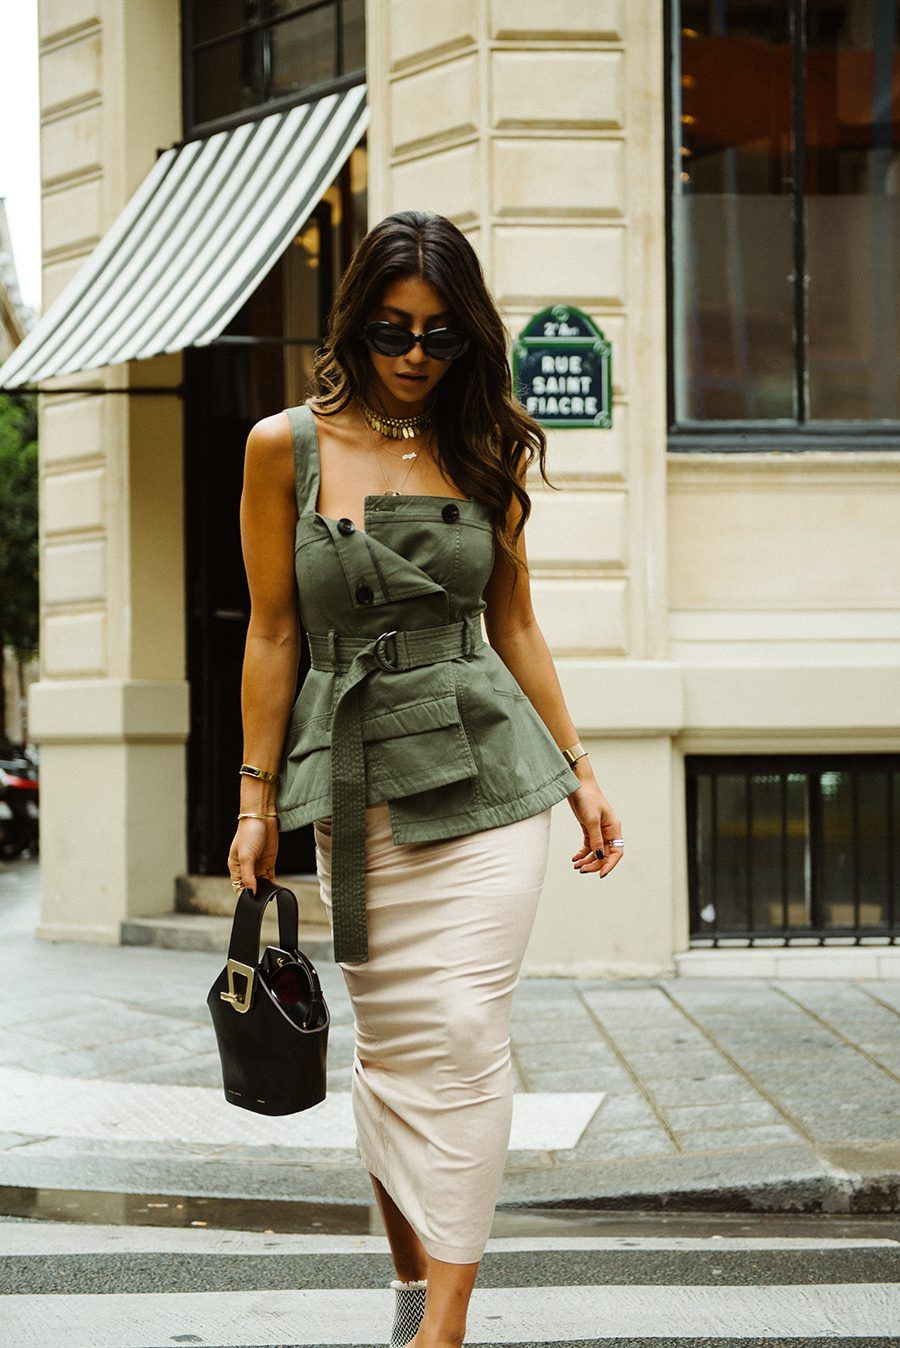 018d8c413d90 marissa web army top fwrd revolve lali skirt mode collective shoes danse  lente bag paris cafe girl mode paris fashion week style streetstyle blogger  not ...